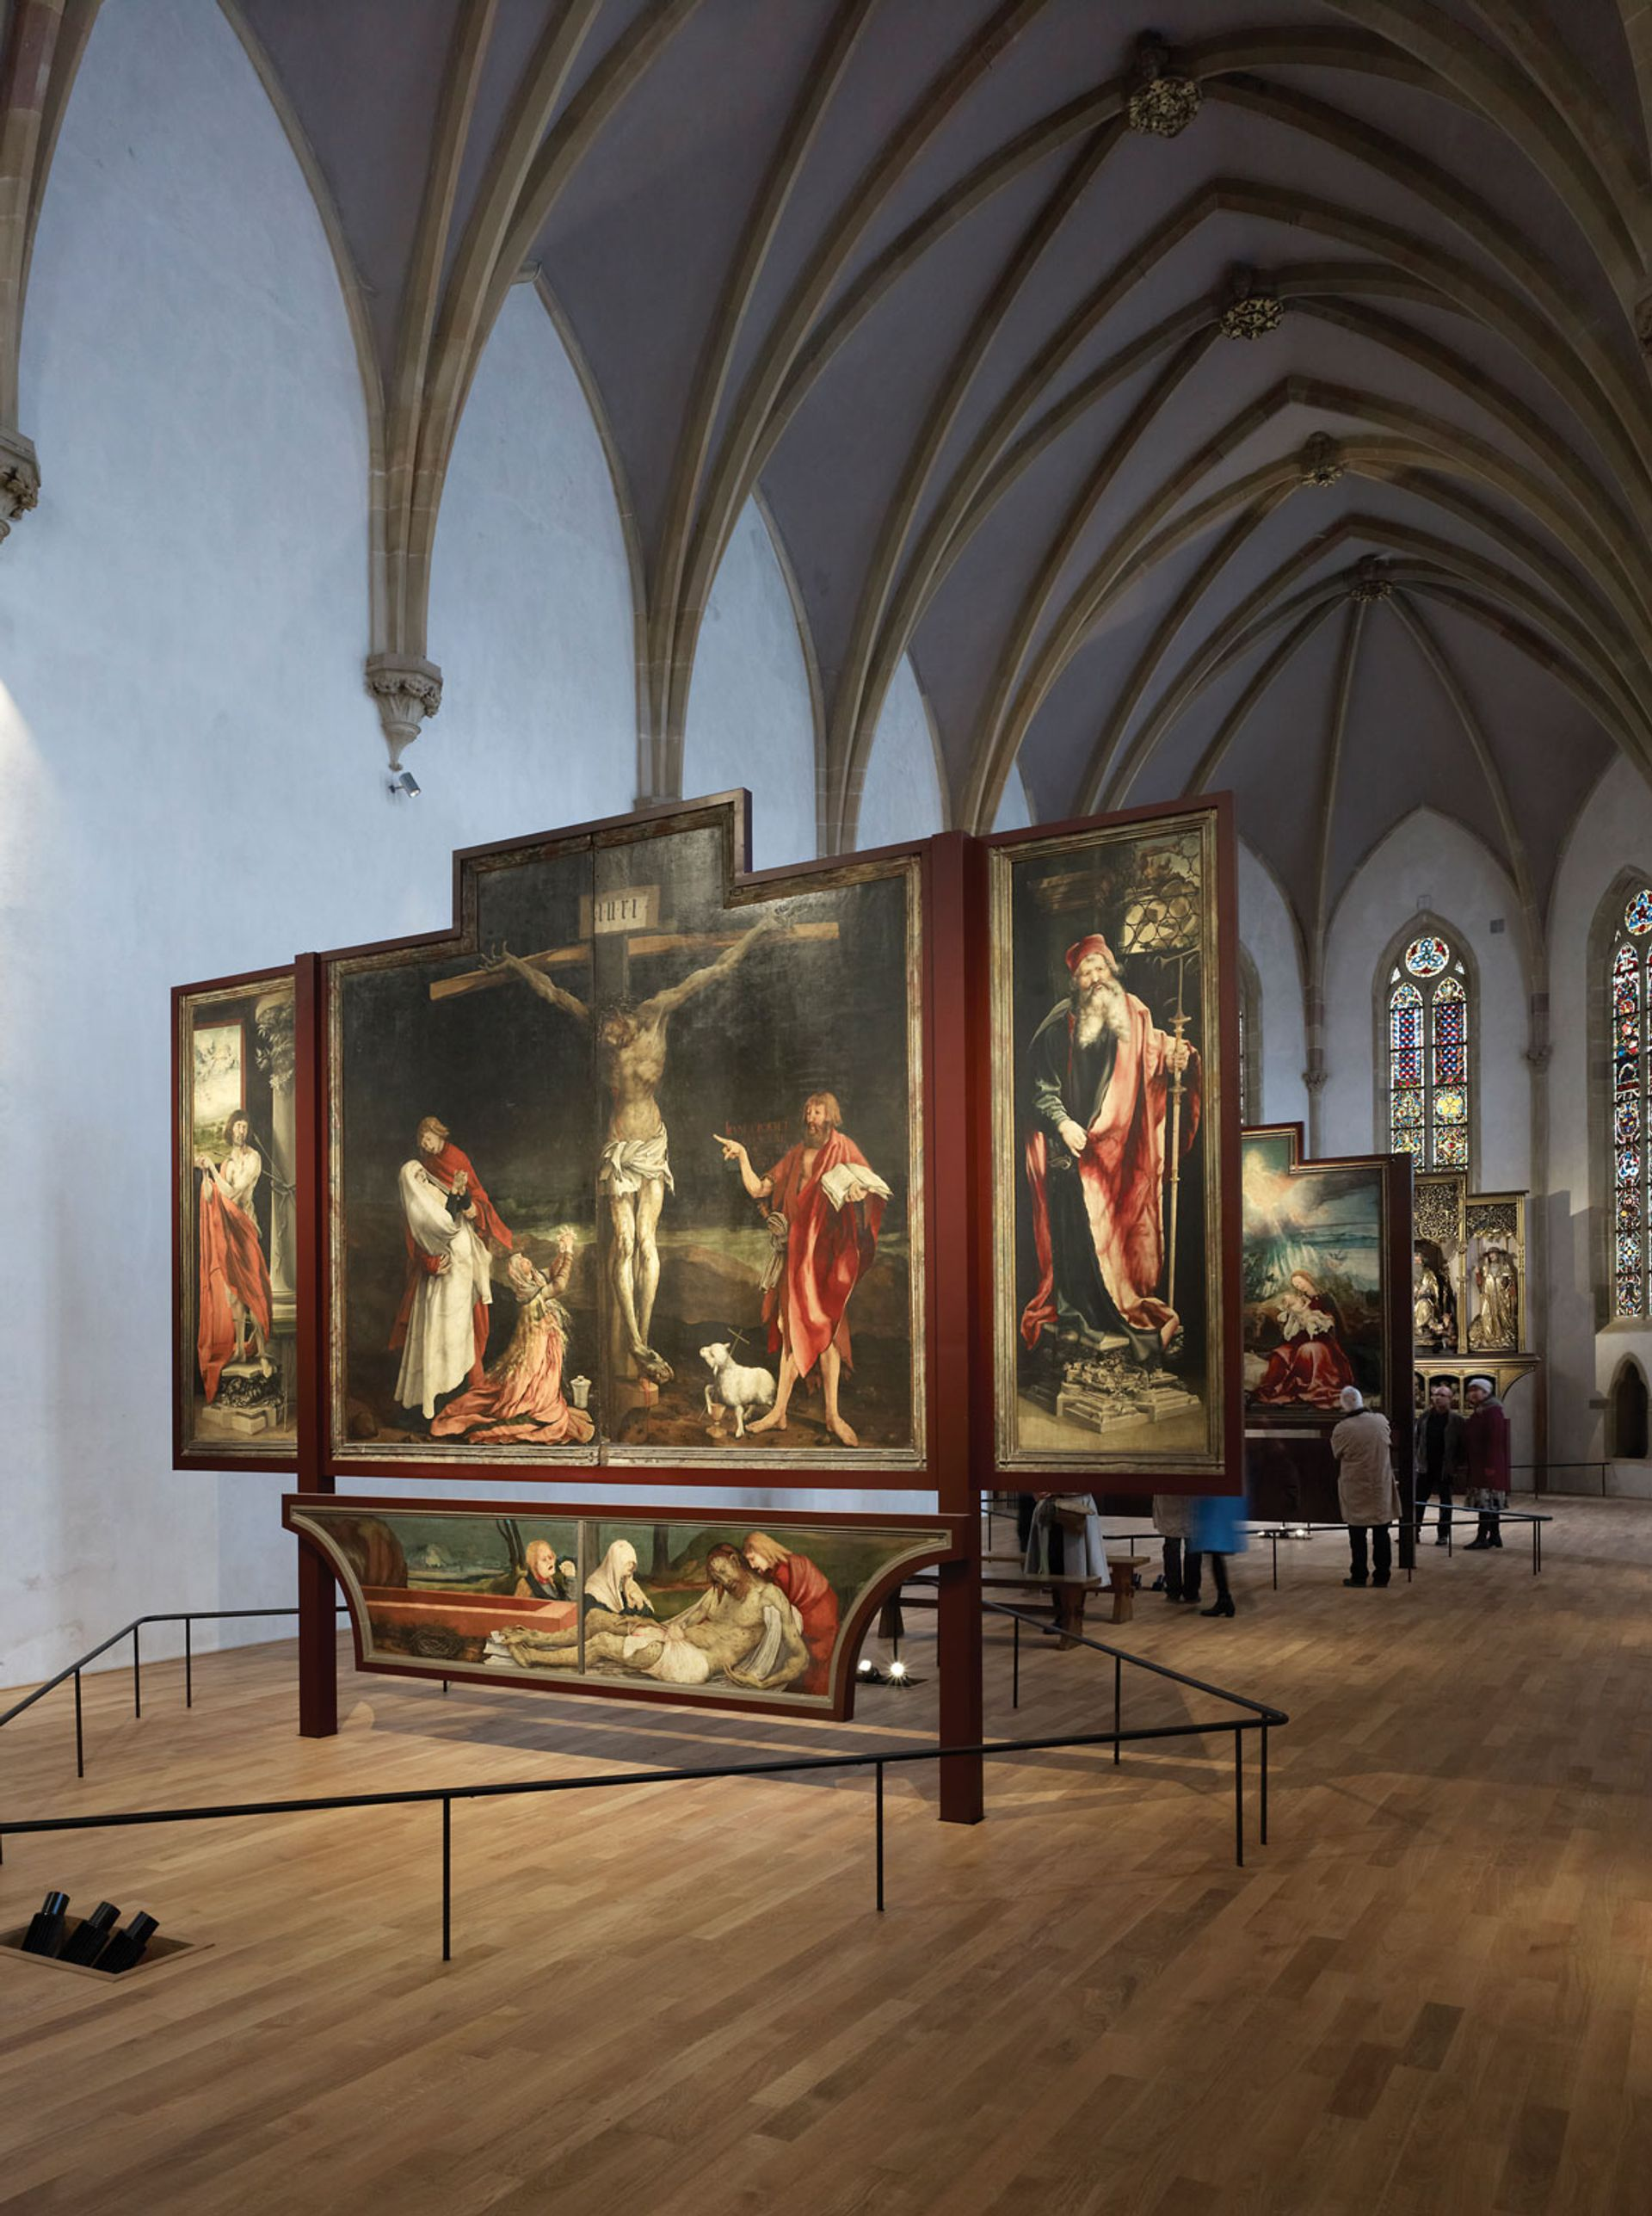 The painted panels will be restored at Colmar's Unterlinden Museum Photo: Ruedi Walti; © Musée Unterlinden